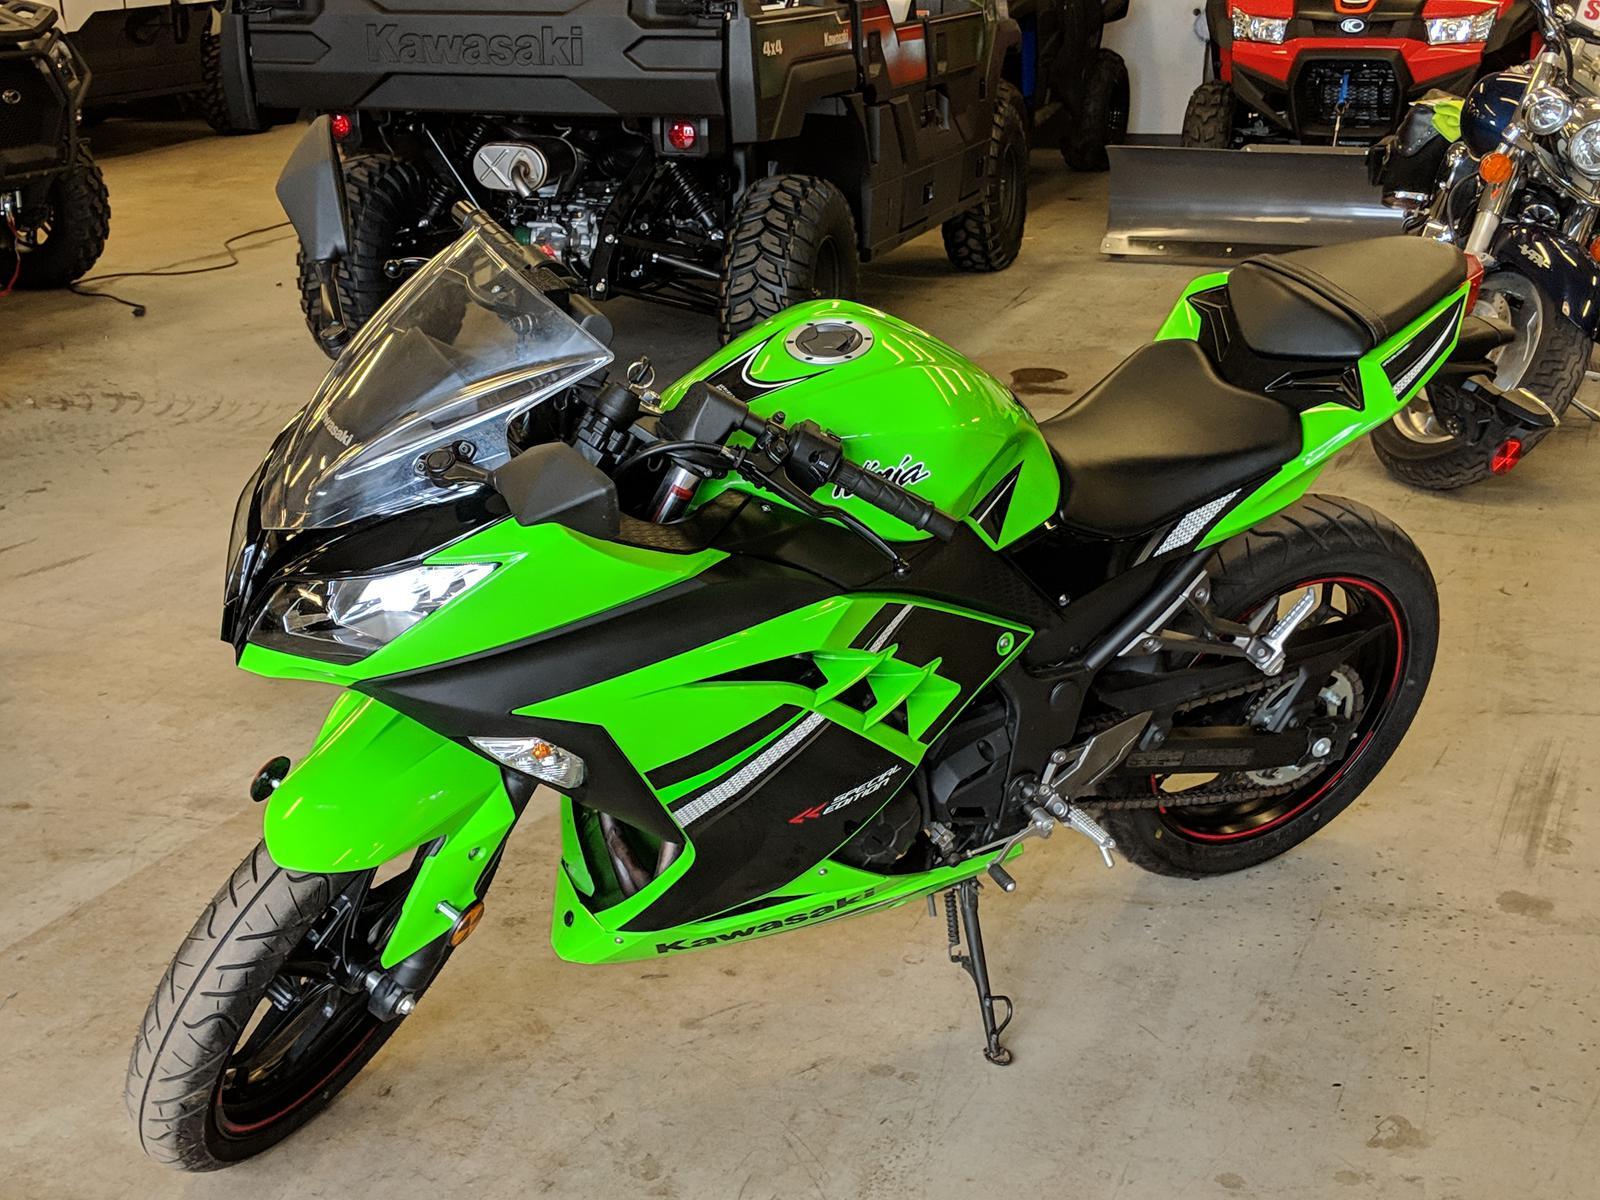 2014 Kawasaki Ninja 300 Se For Sale In Bloomsburg Pa Bloomsburg